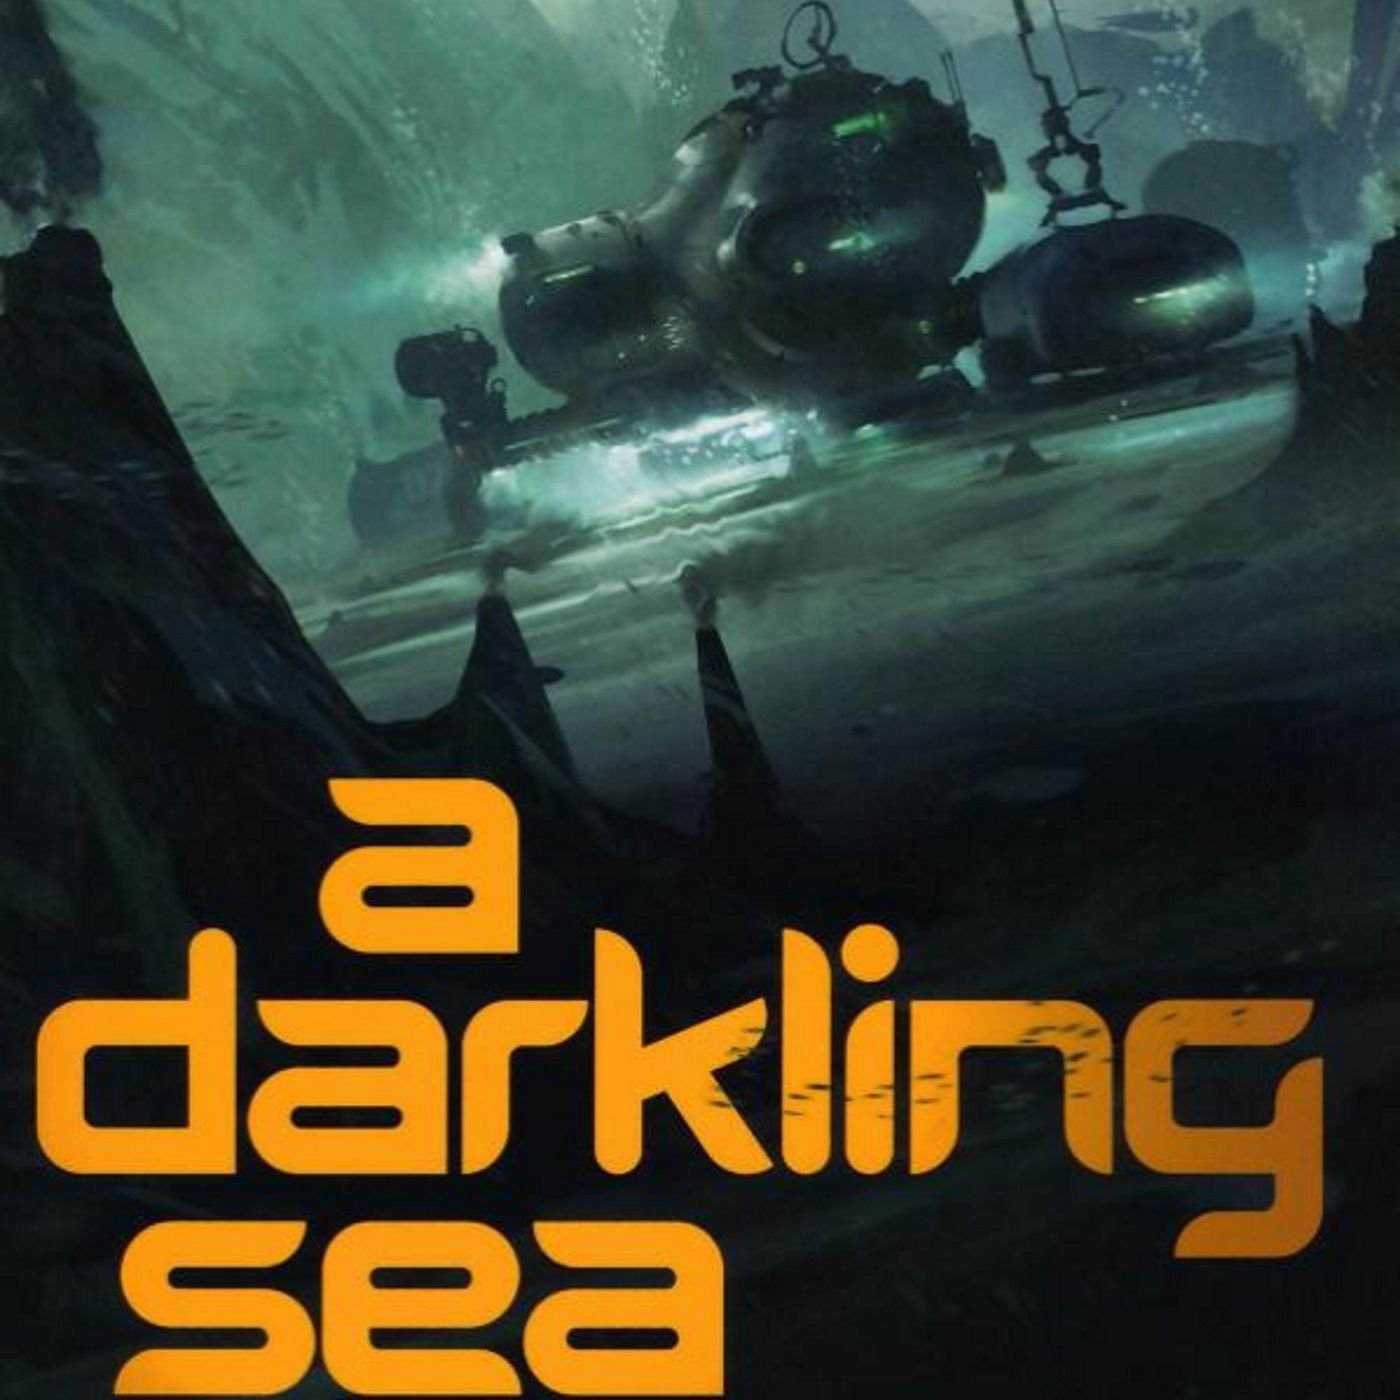 Book-Space! #9. A Darkling Sea by James L. Cambias